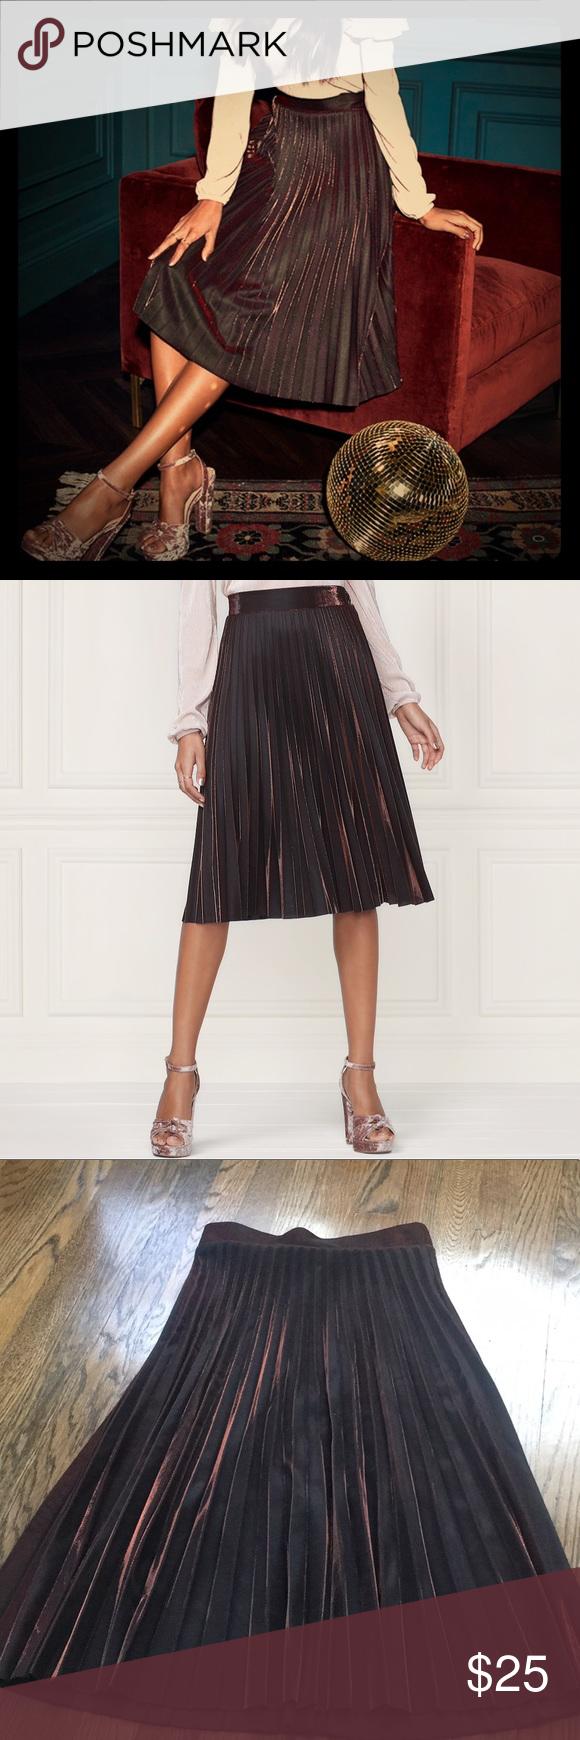 109bacd83 Lauren Conrad runaway collection metallic skirt Lauren Conrad runaway  collection metallic copper pleated skirt! BNWT! ❌no trades LC Lauren Conrad  Skirts